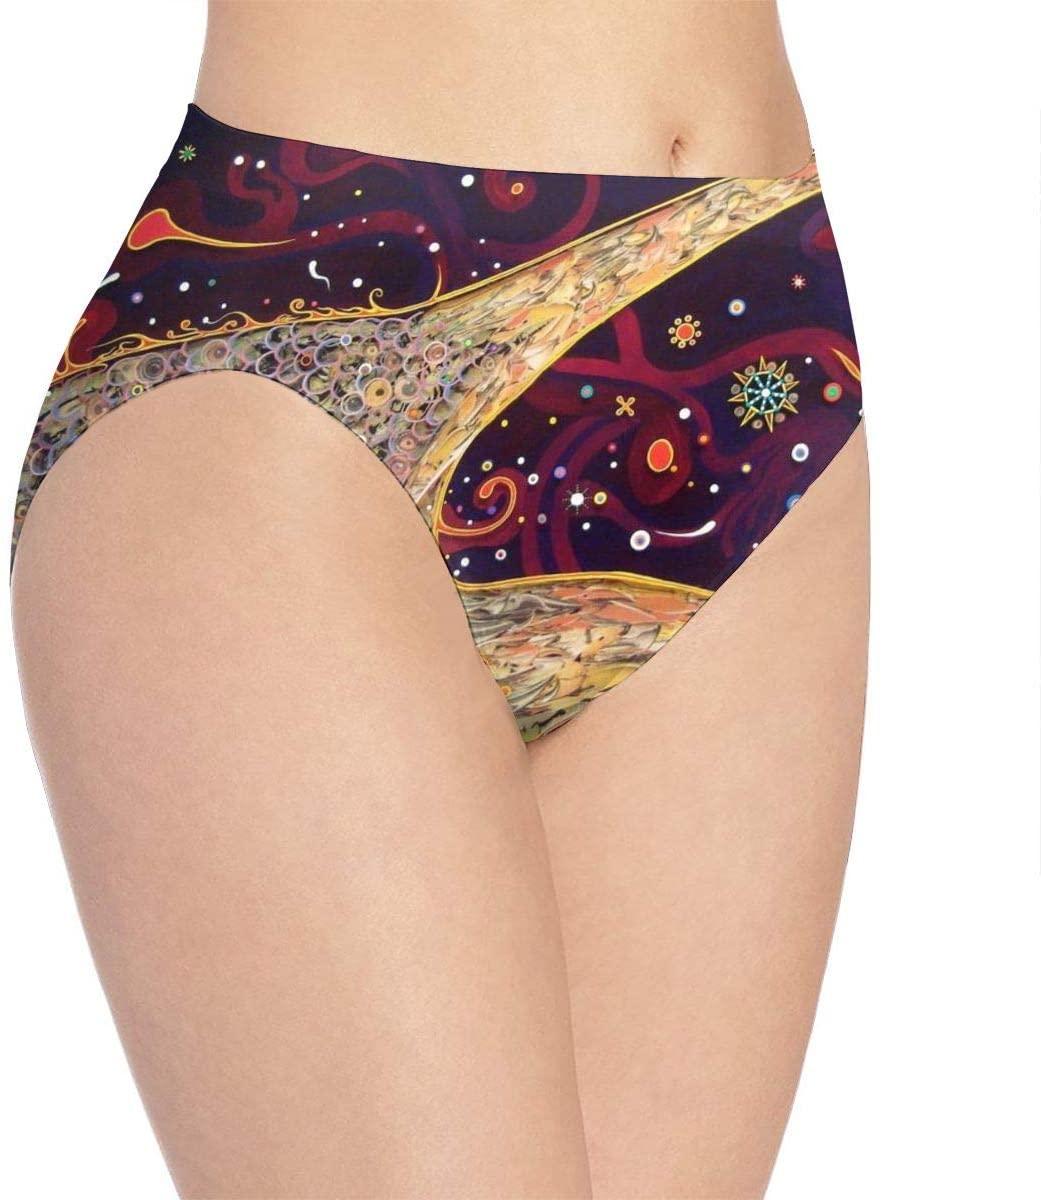 Kjaoi 3D Print Soft Women's Underwear, Hippie Fashion Flirty Sexy Lady's Panties Briefs